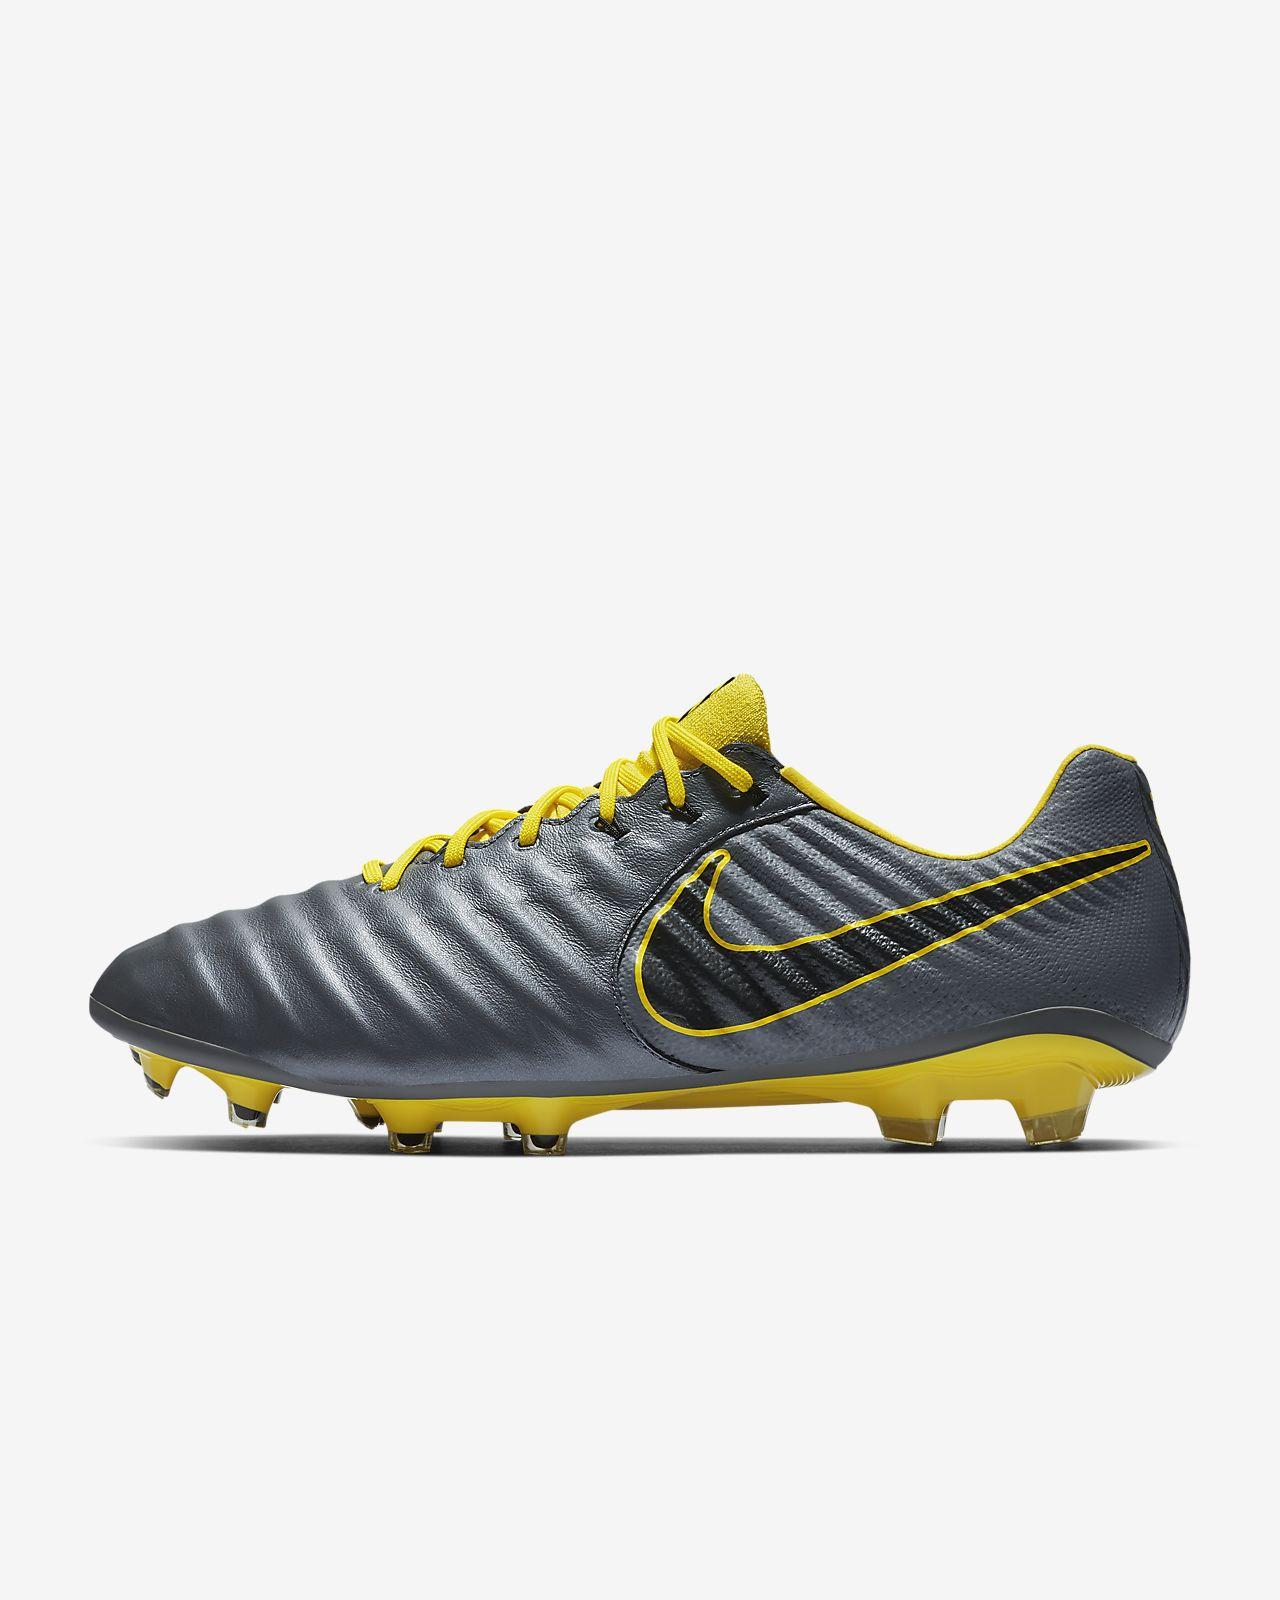 ee9f77d5dc378 Nike Legend 7 Elite FG Game Over Botas de fútbol para terreno firme ...